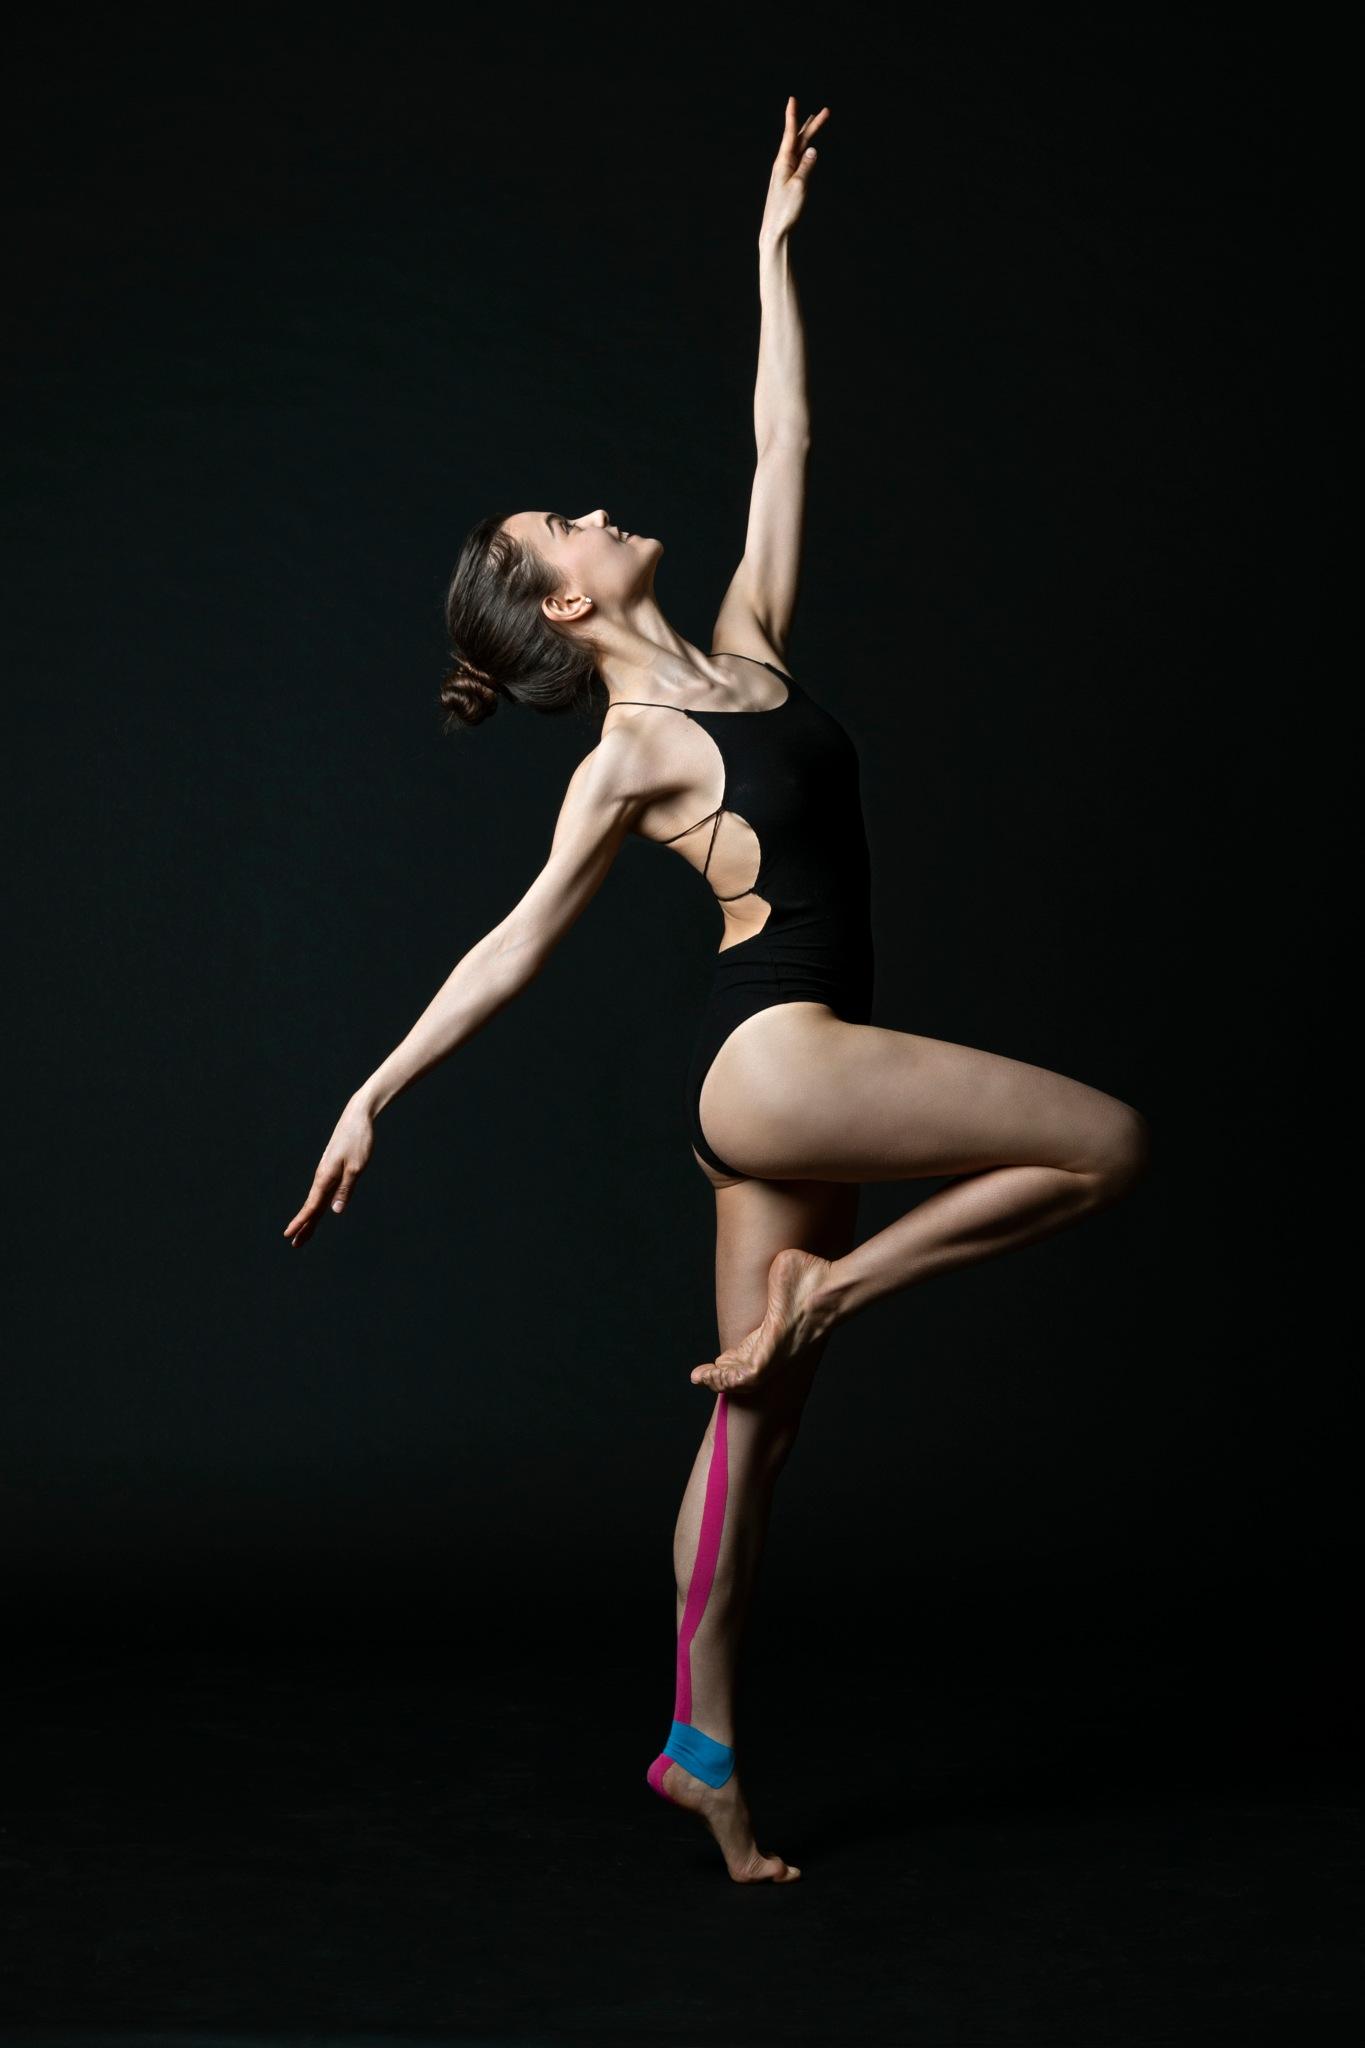 The Ballerina  by Robb Harding Photography